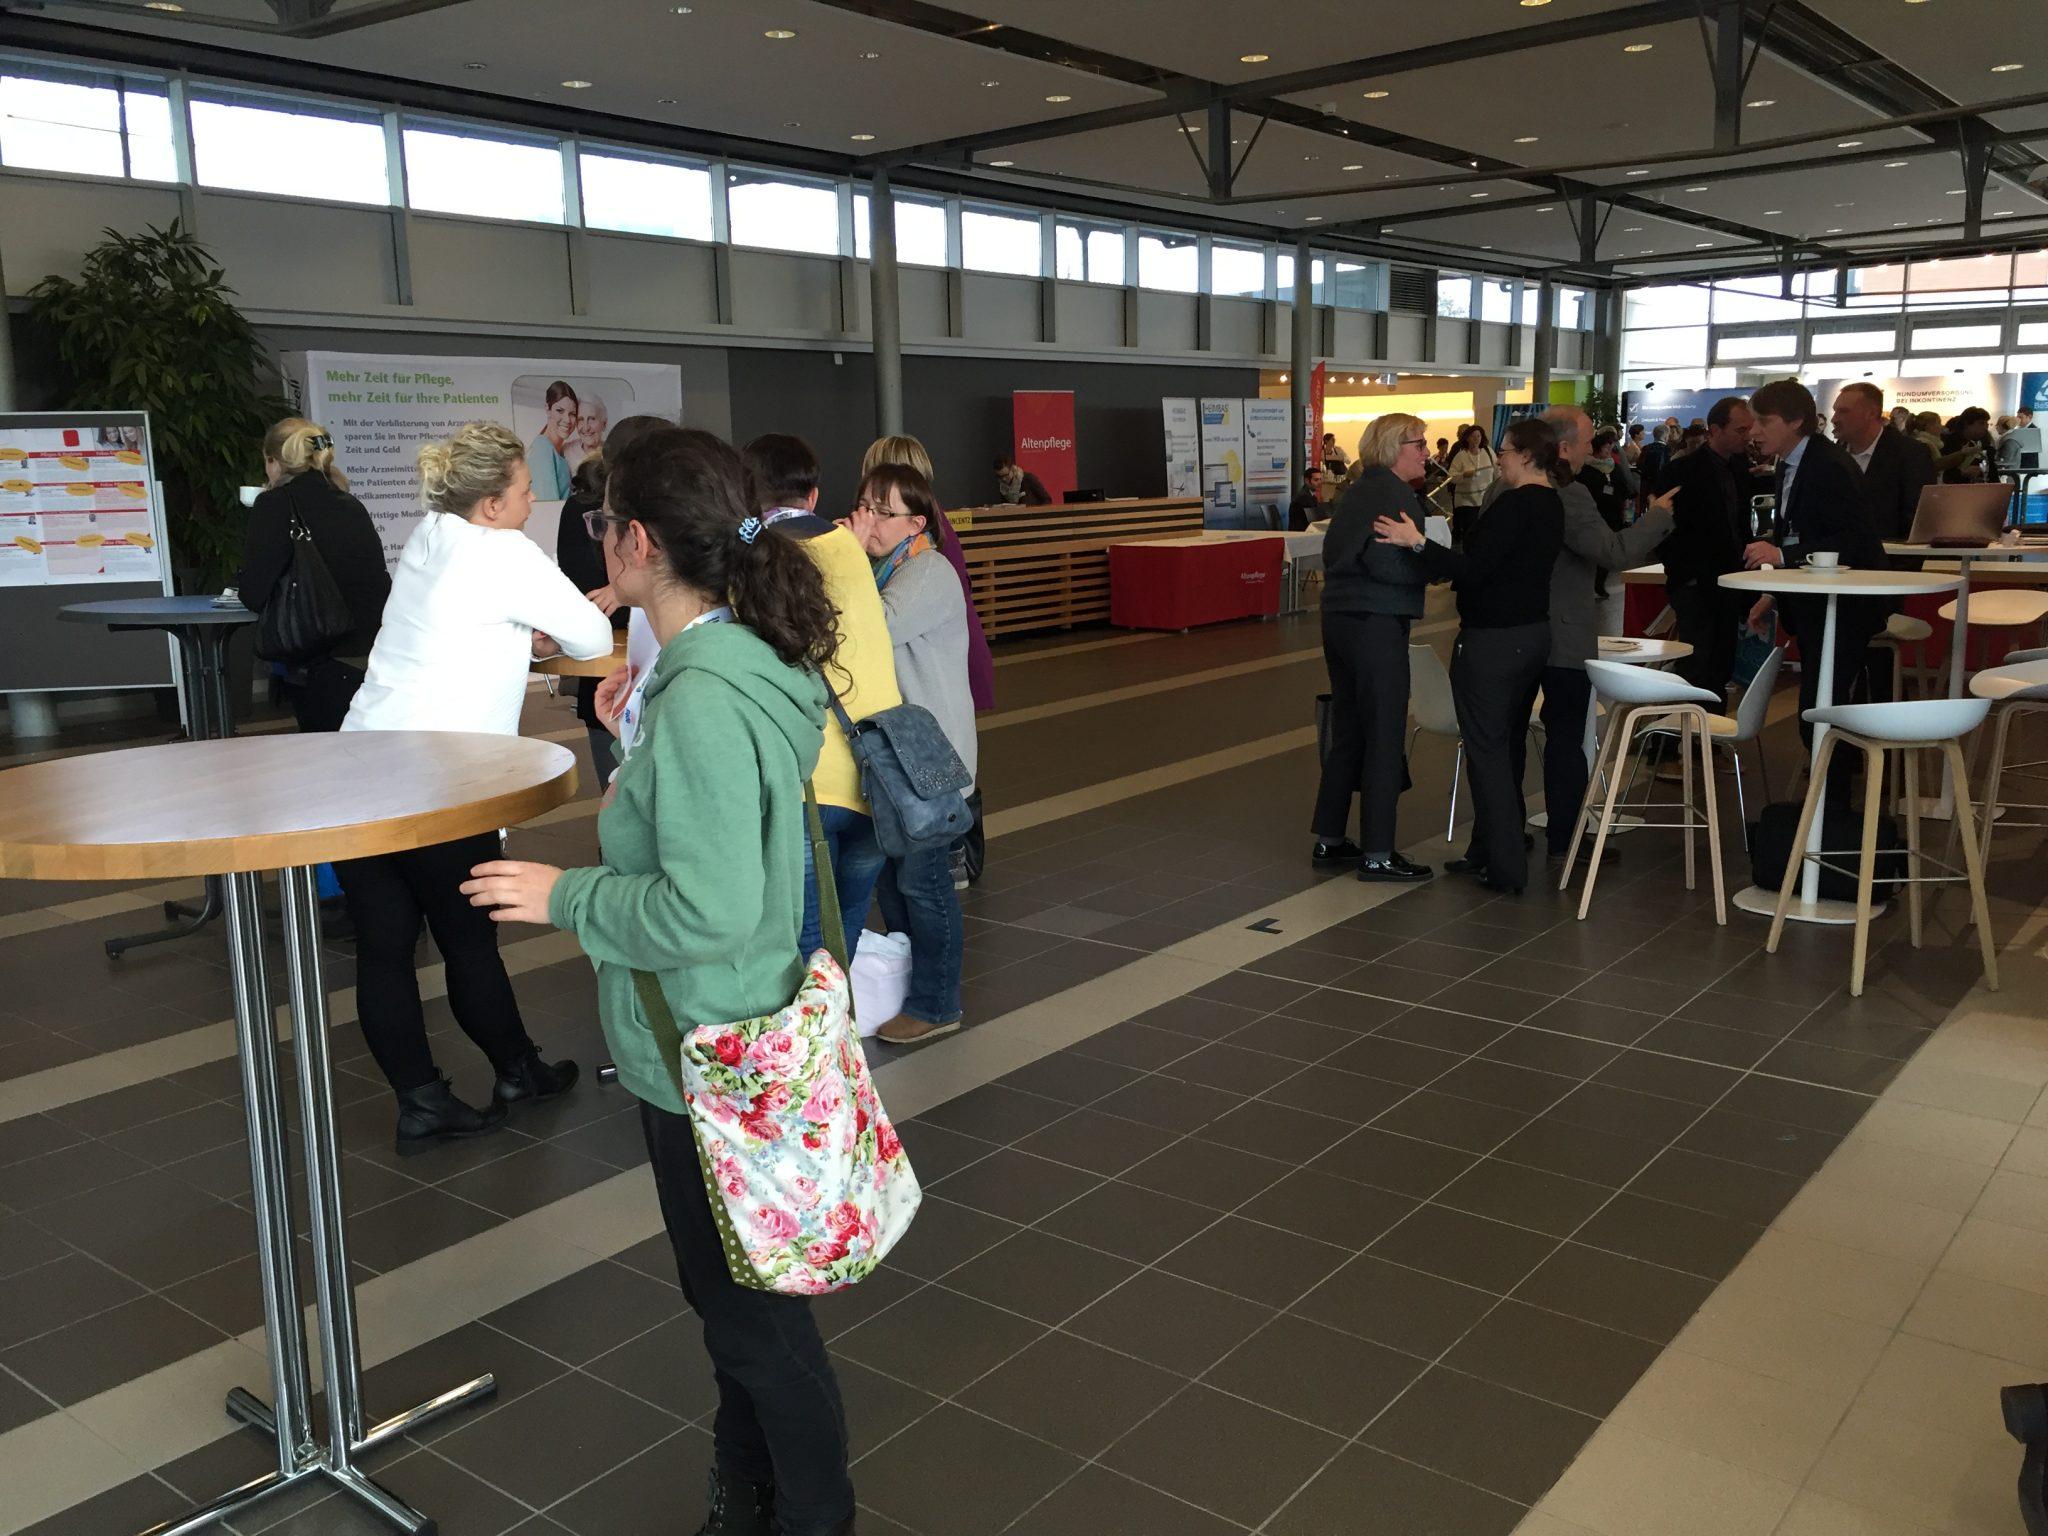 Messe Ulm Altenpflegekongress